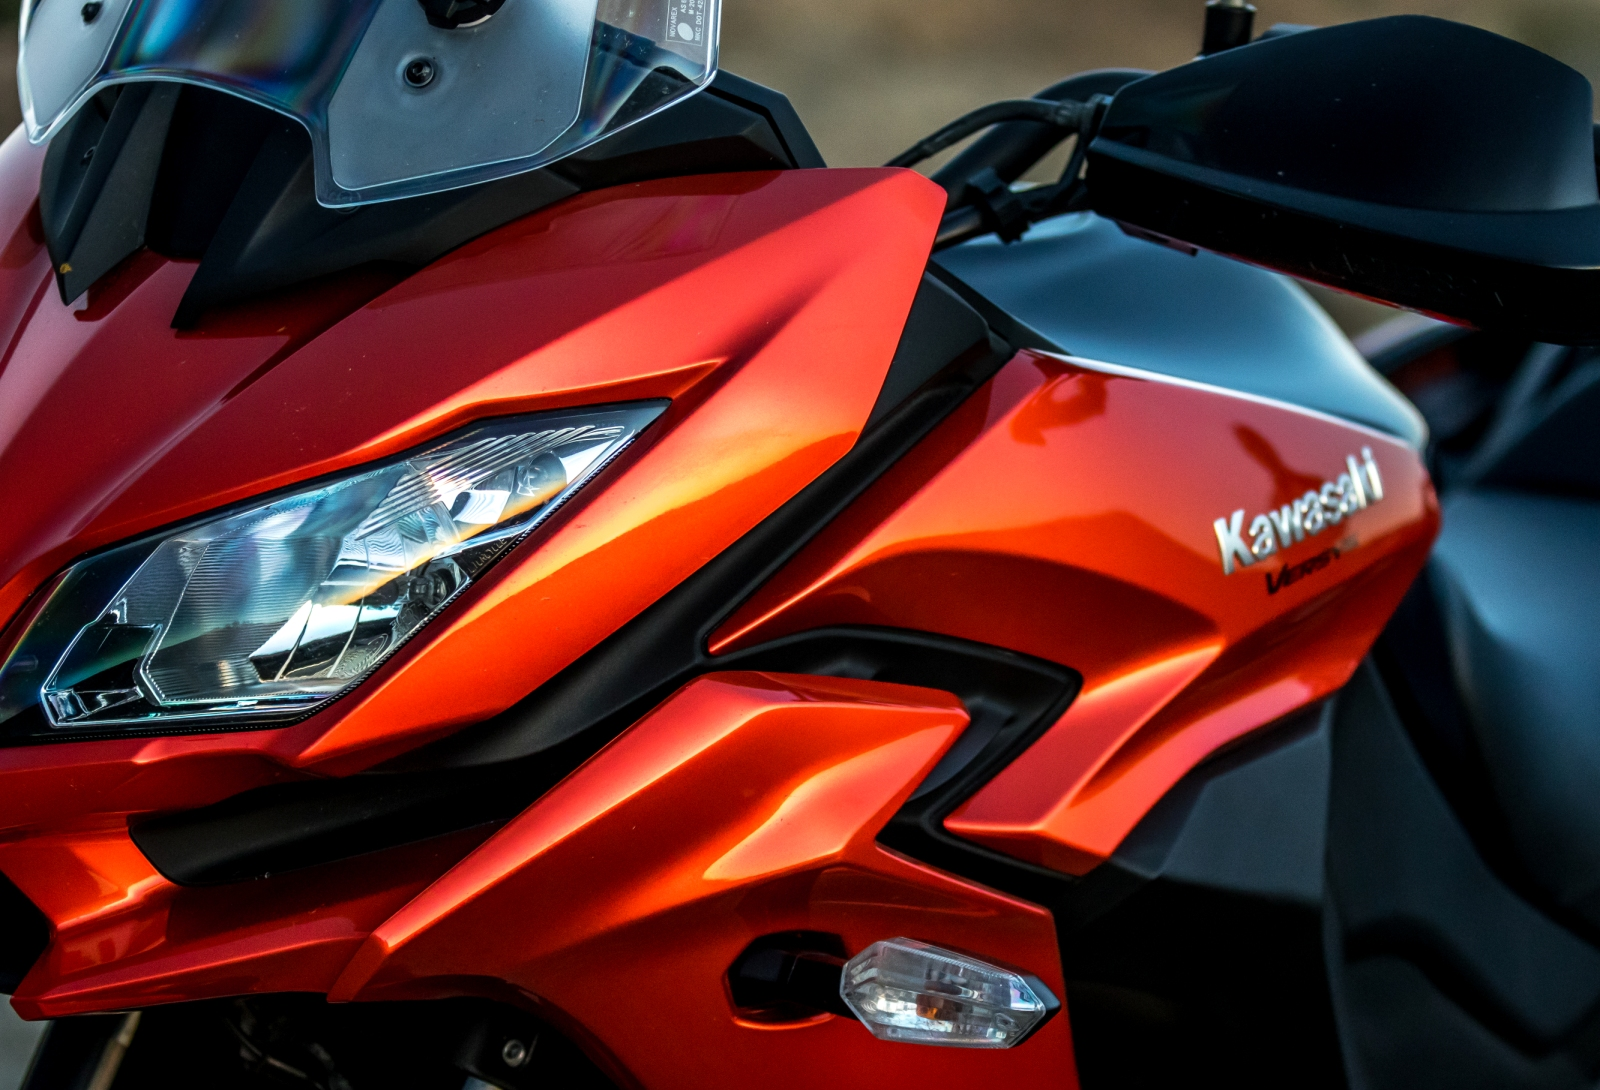 orange 2015 kawasaki versys 1000 lt review  at nearapp.co